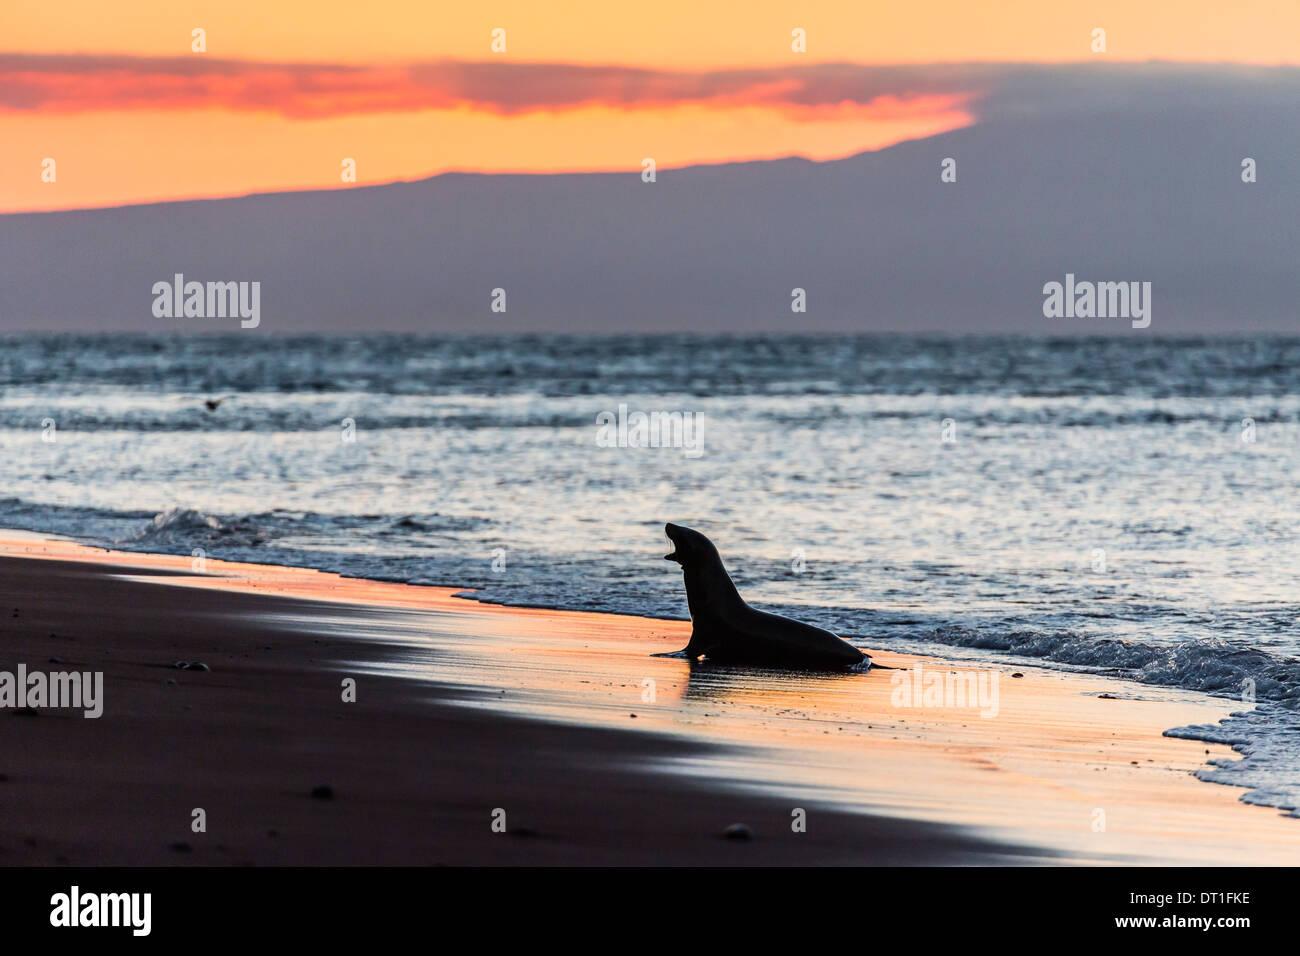 Galapagos sea lion ( Zalophus wollebaeki) on beach at sunset on Rabida Island, Galapagos Islands, UNESCO Site, Ecuador - Stock Image